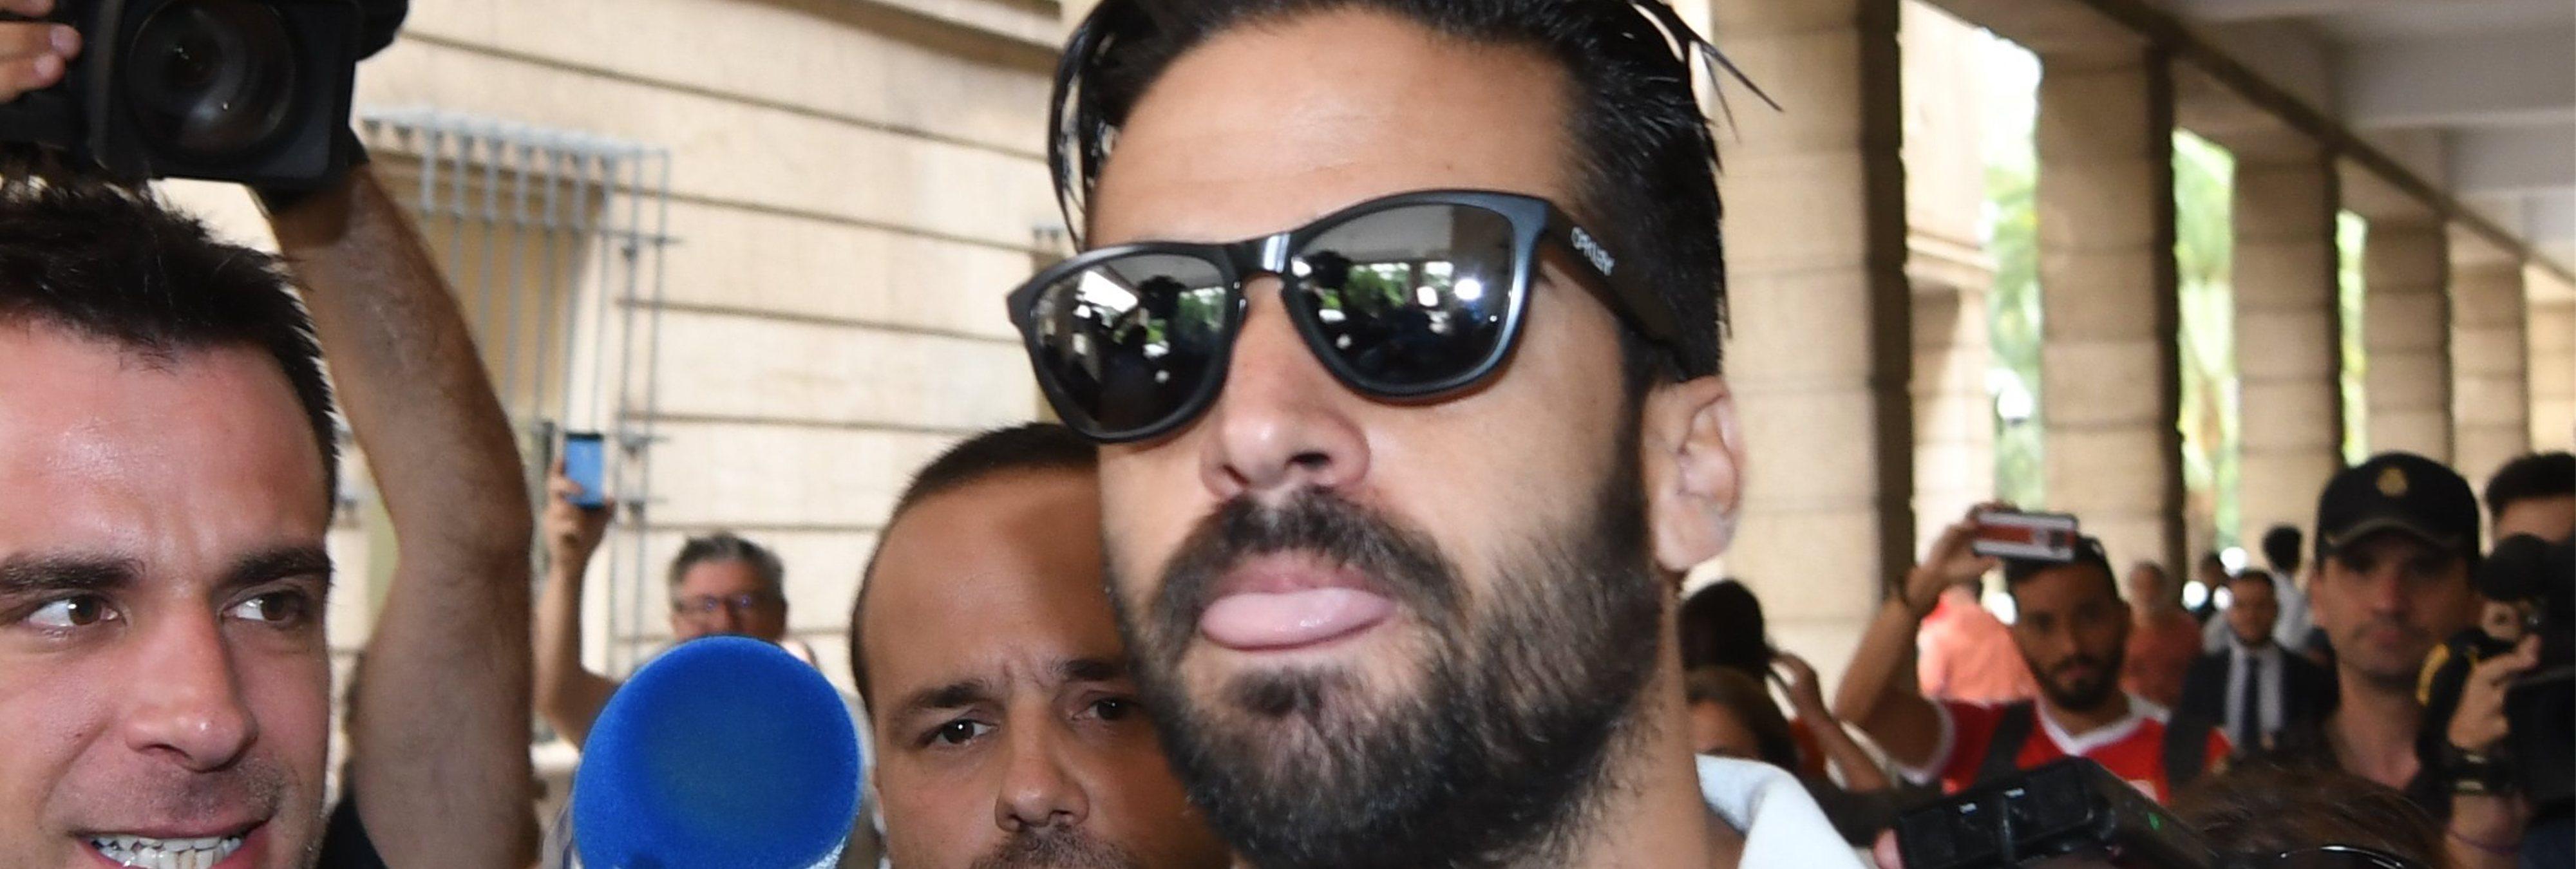 El guardia civil de 'La Manada', que intentó renovar el pasaporte, seguirá en libertad provisional